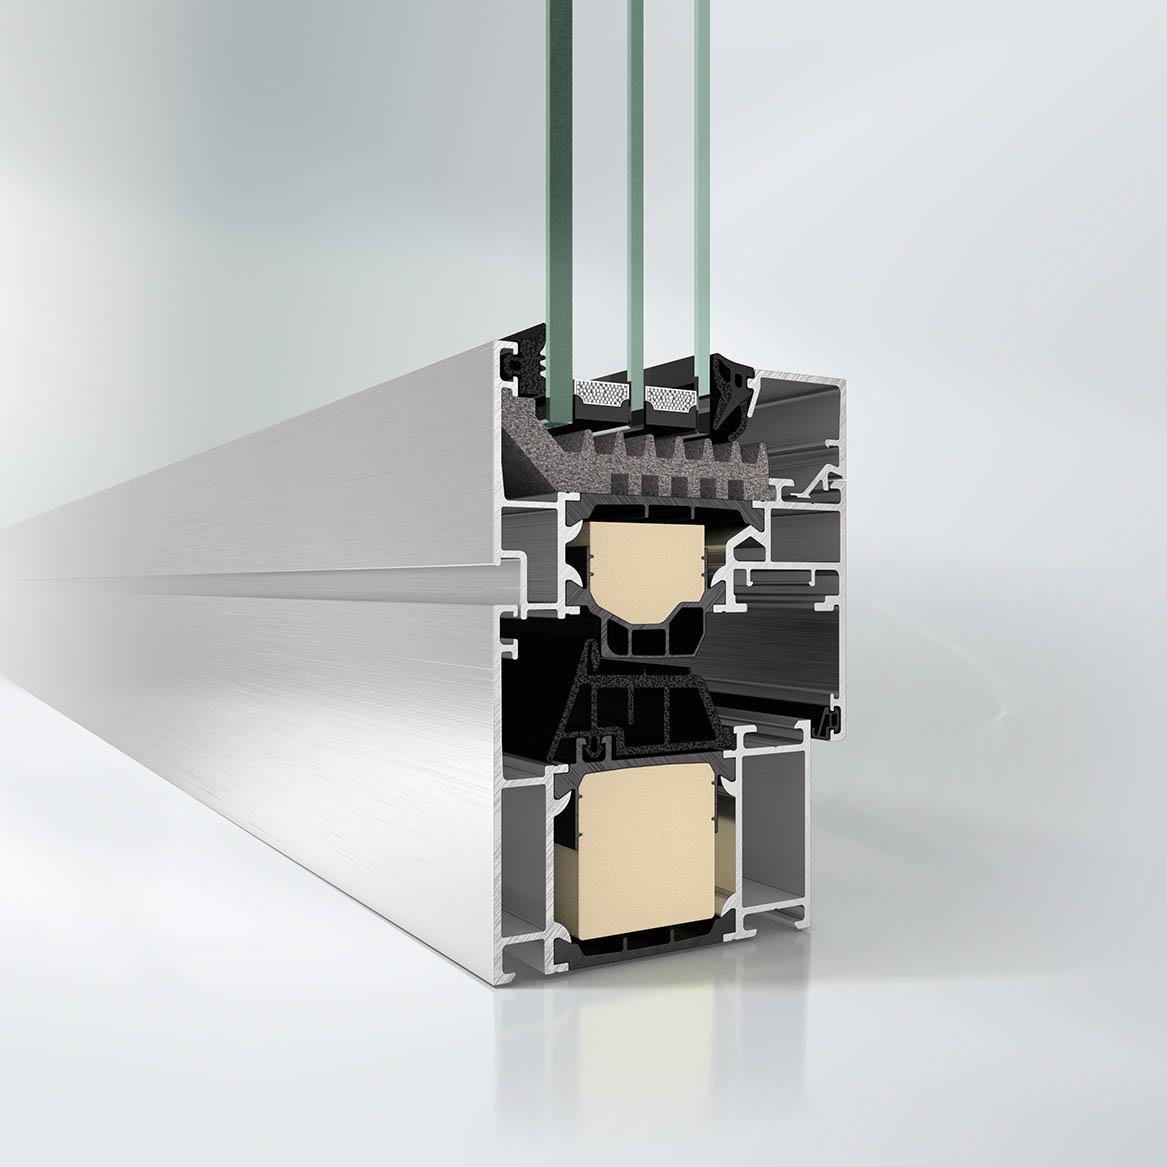 Schuco AWS 65 Window System